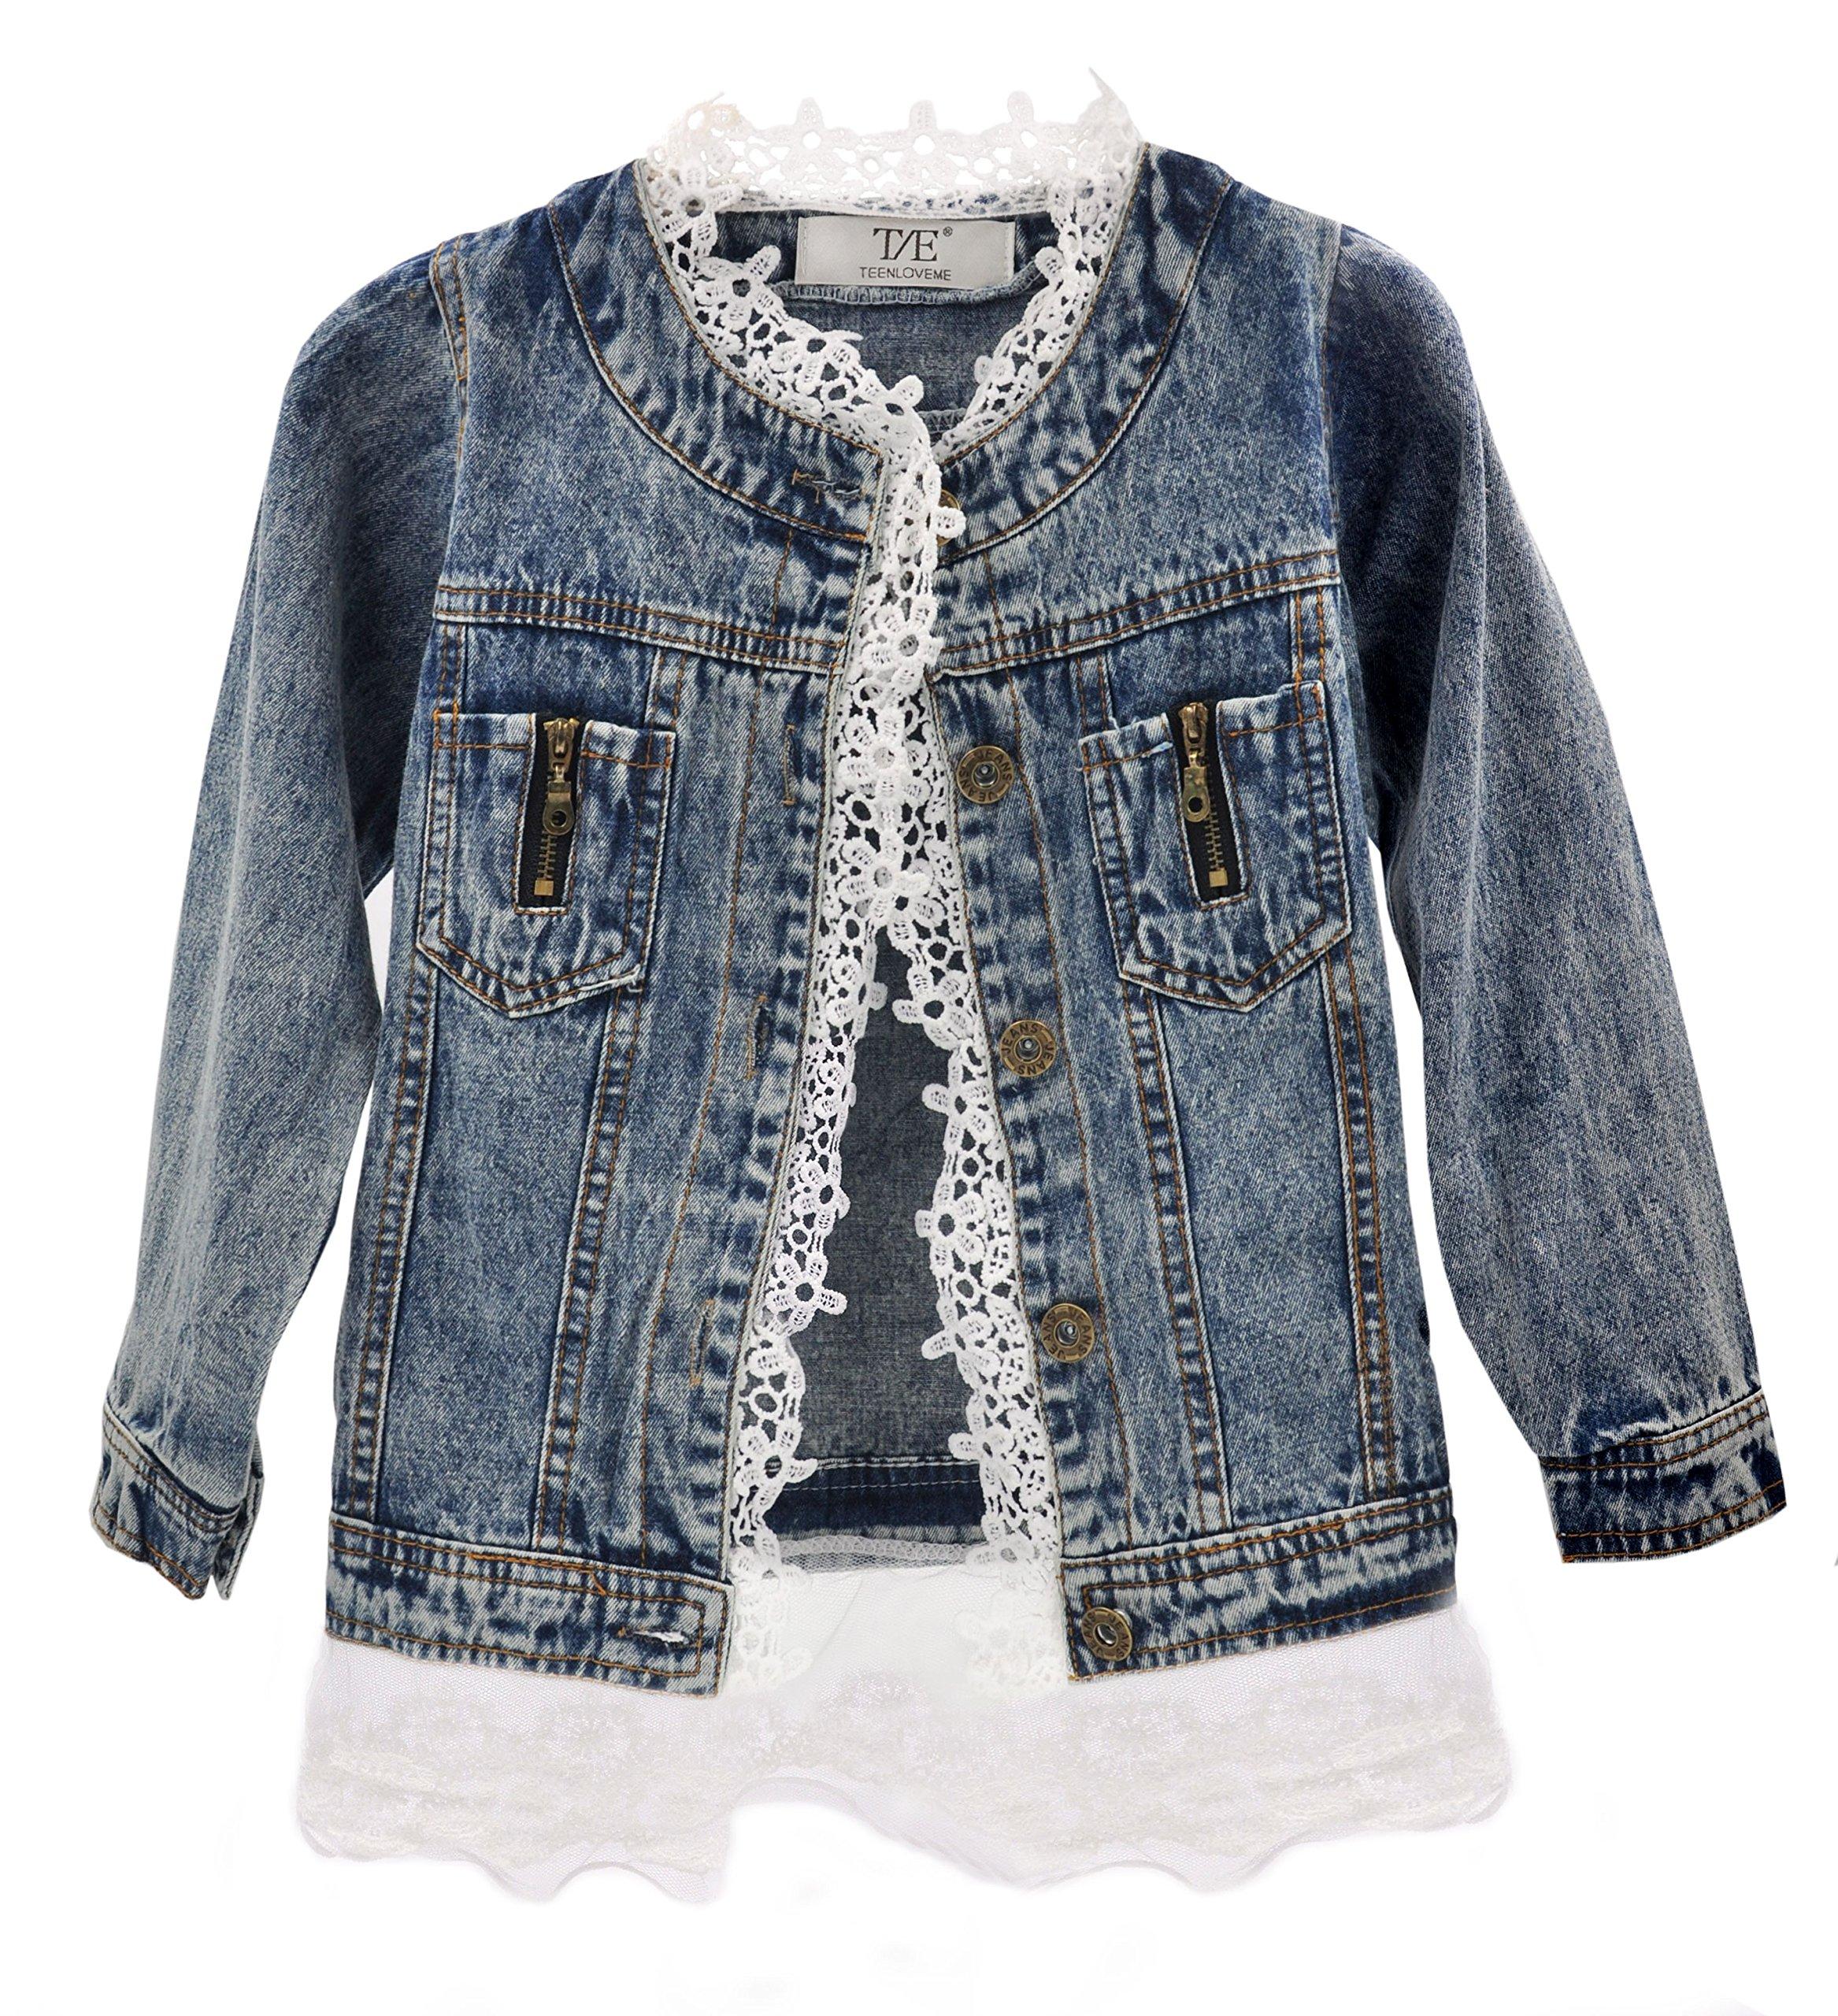 Artfasion Baby Girls/Girls Denim Jean Jacket Lace Cowboy Jacket Denim Dress Coat (5-6 years/120cm, Denim)